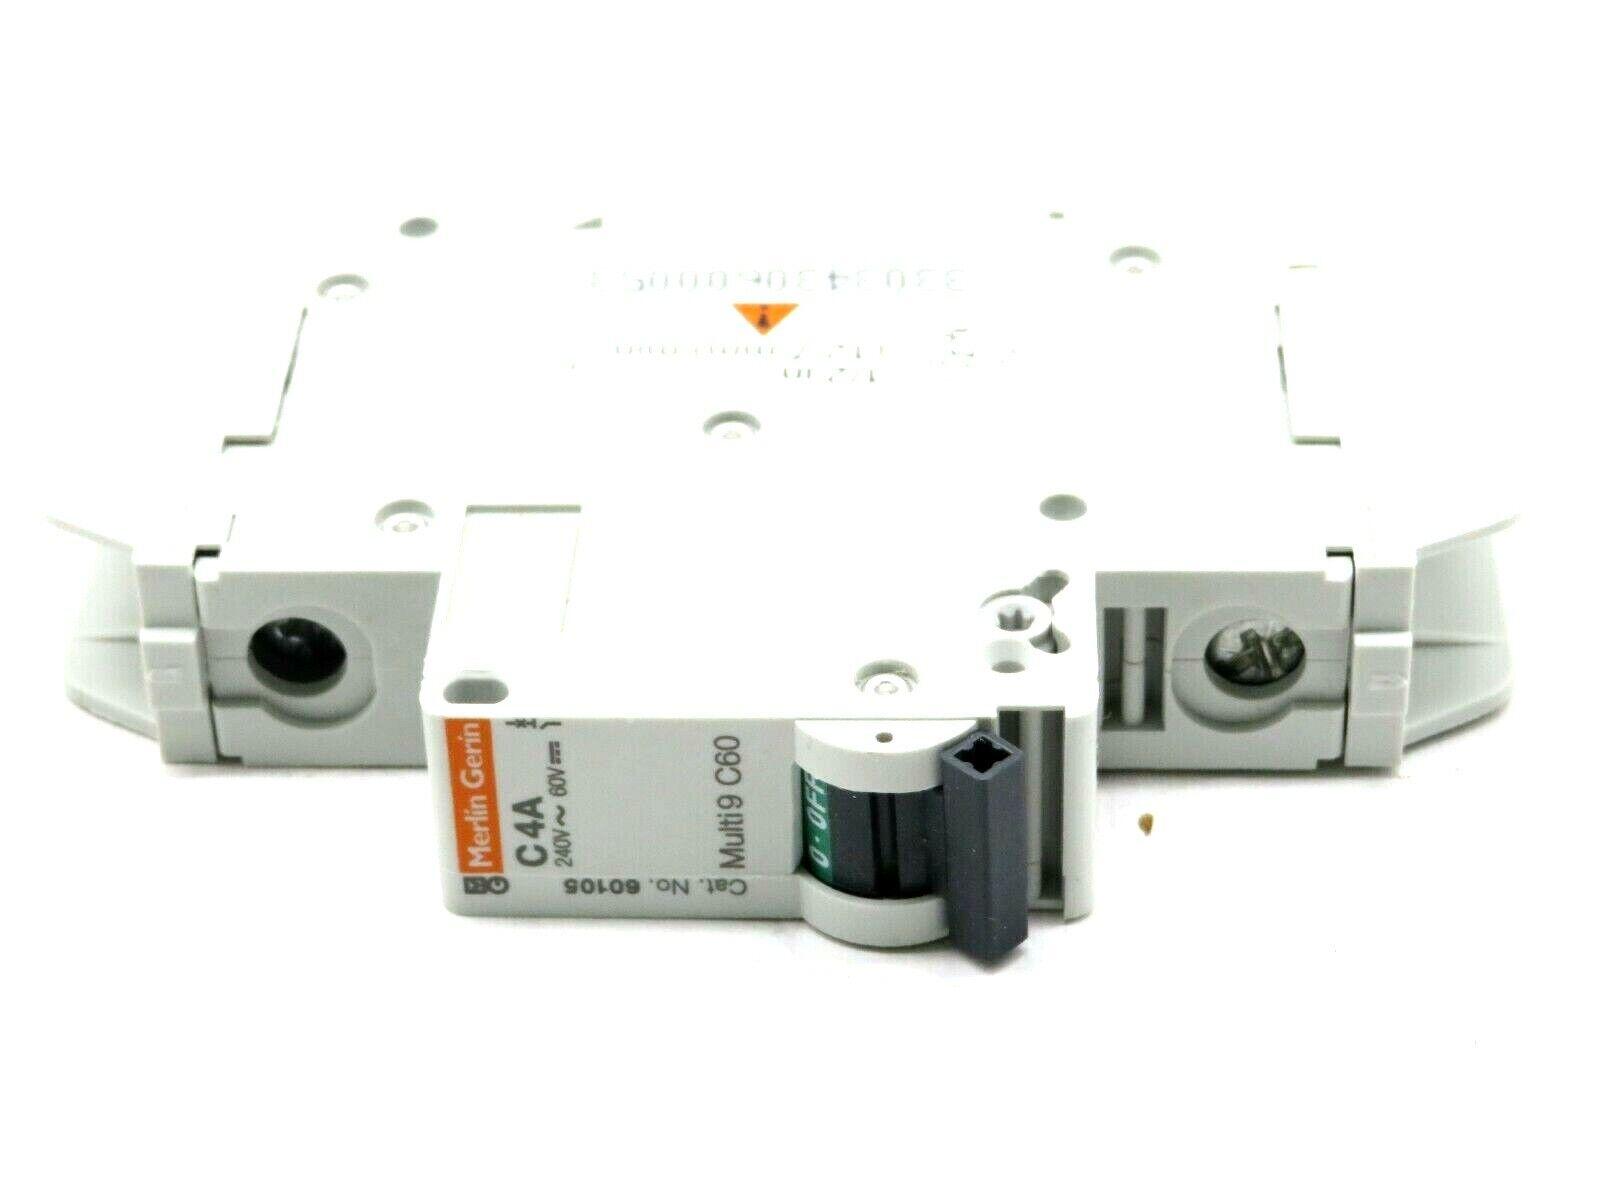 Square D Circuit Breaker 60105 Multi 9 C60 Merlin Gerin